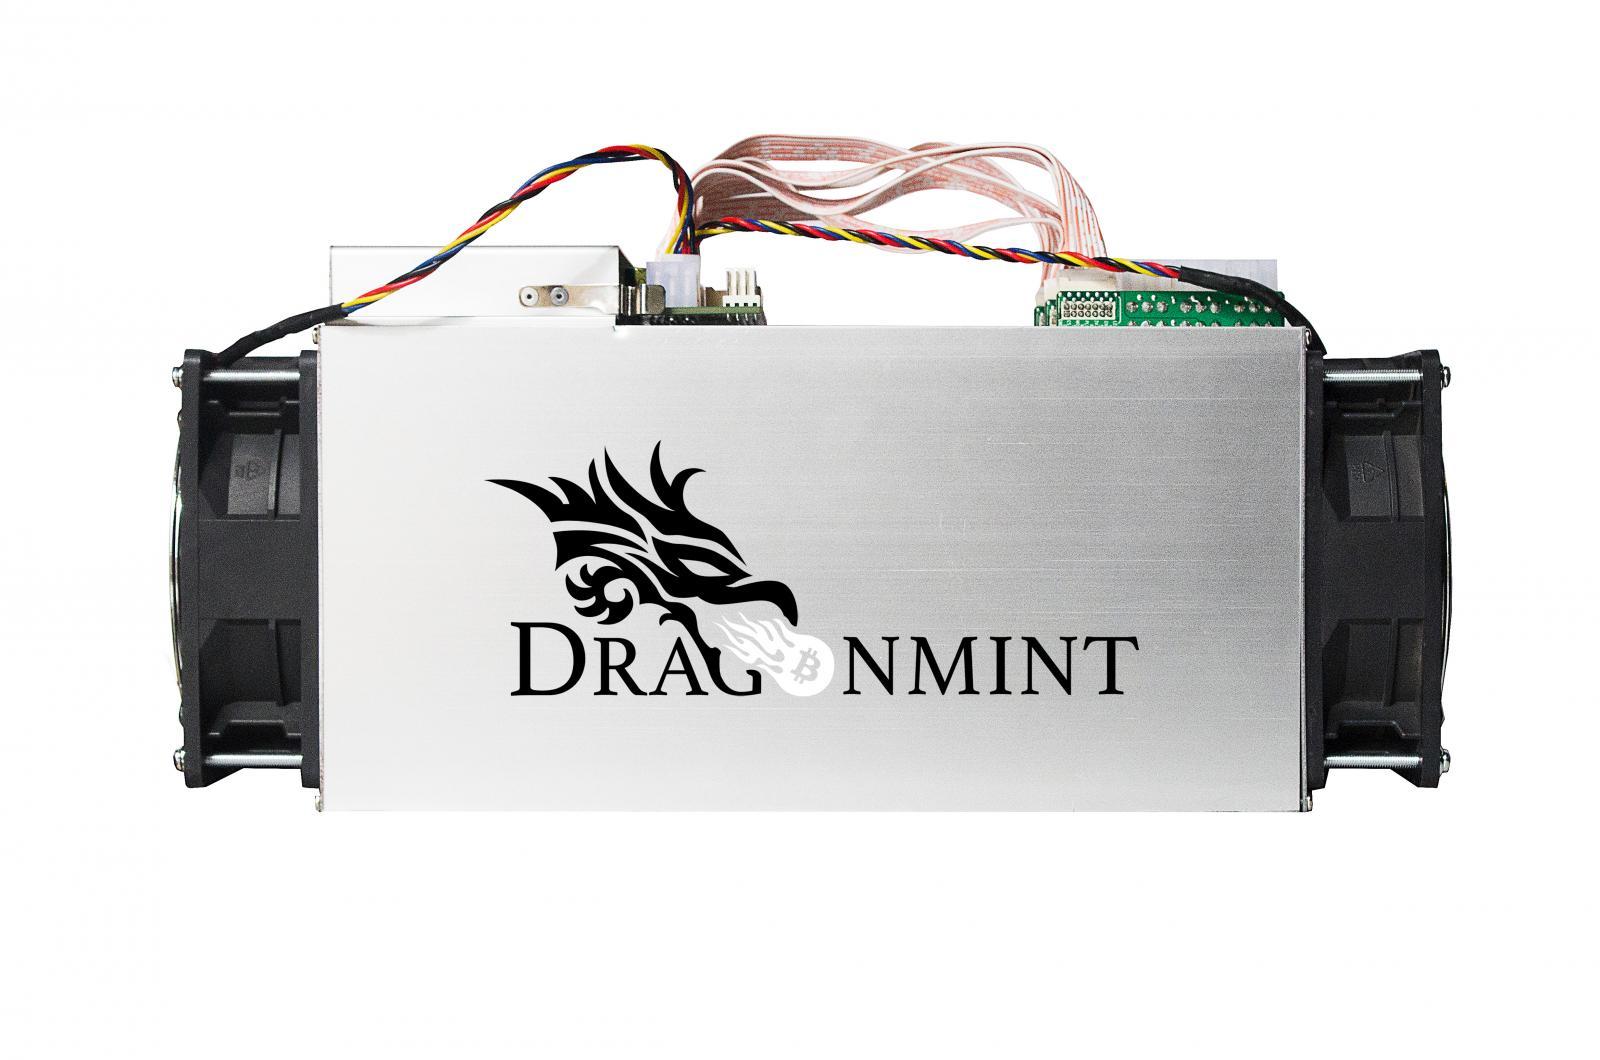 DRAGONMINT X2 MINER 248KH/S